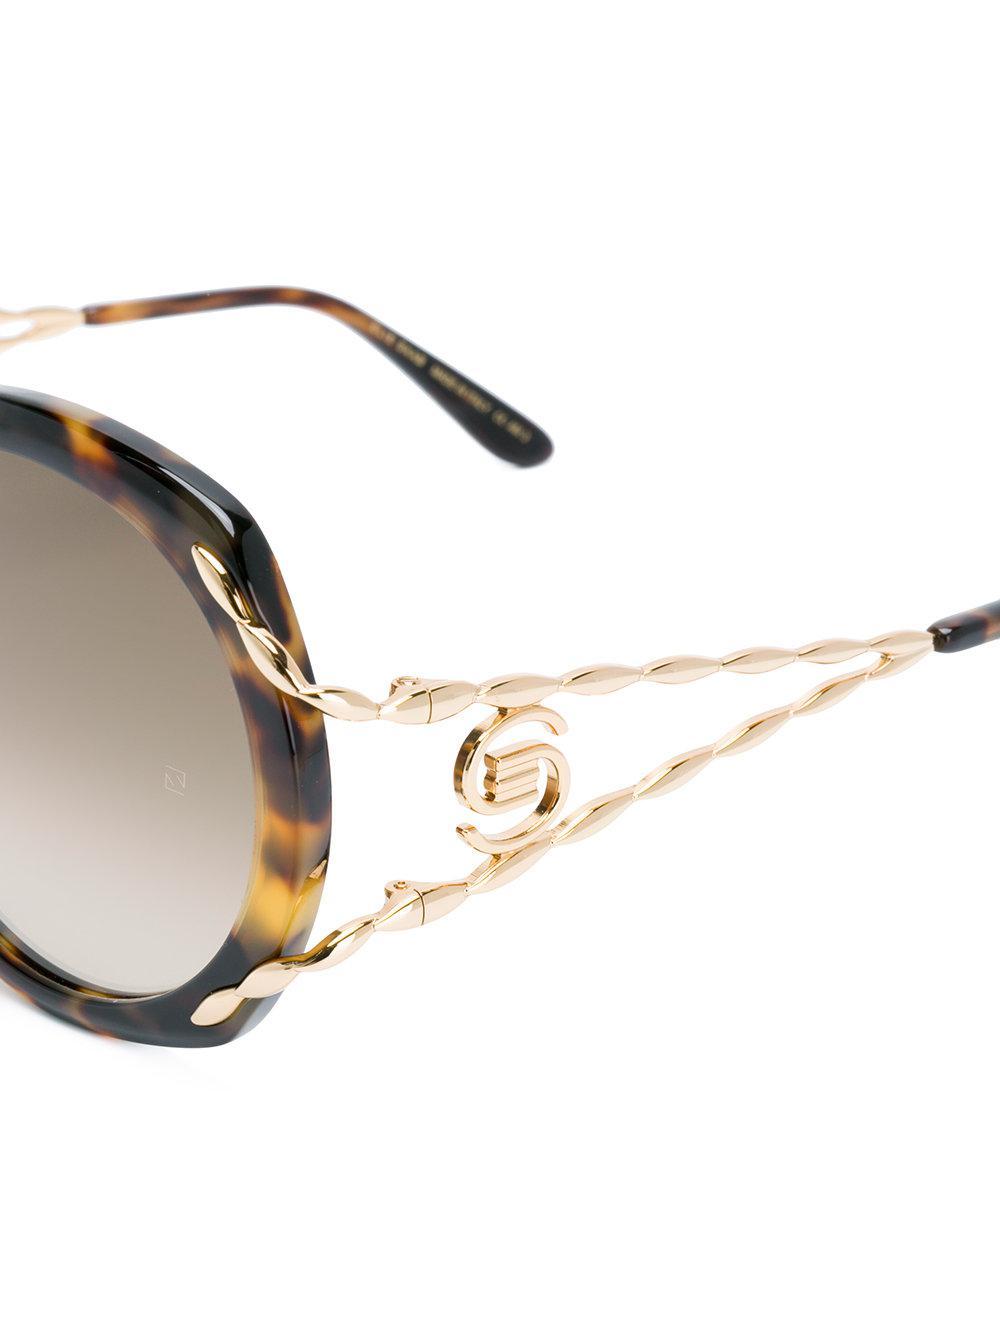 Elie Saab Tortoiseshell Oversized Logo Sunglasses in Brown